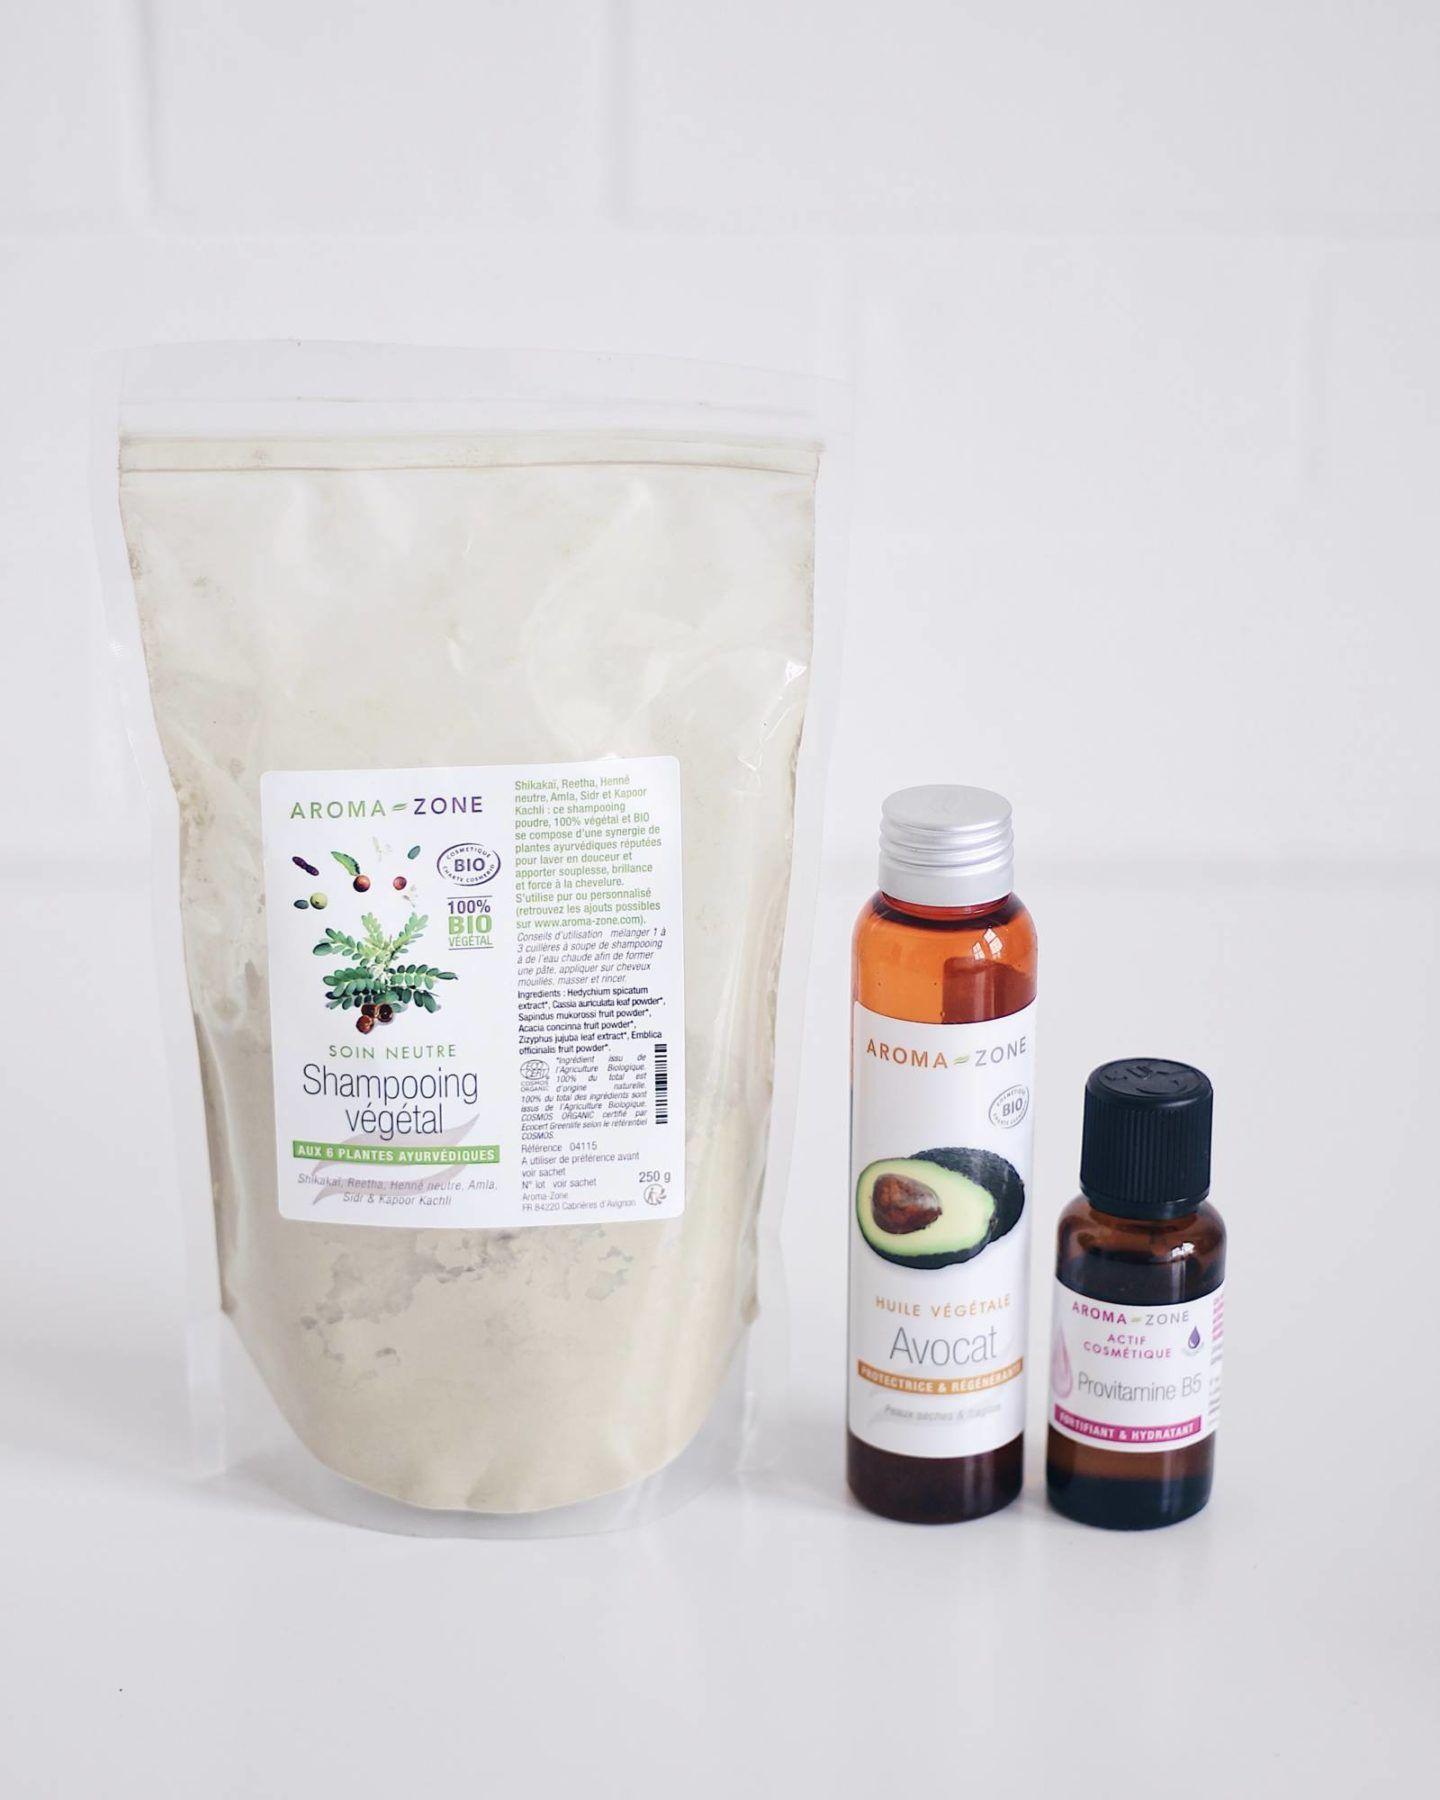 Shampoing Vegetal Bio Aroma Zone Mon Avis Shampoing Vegetal